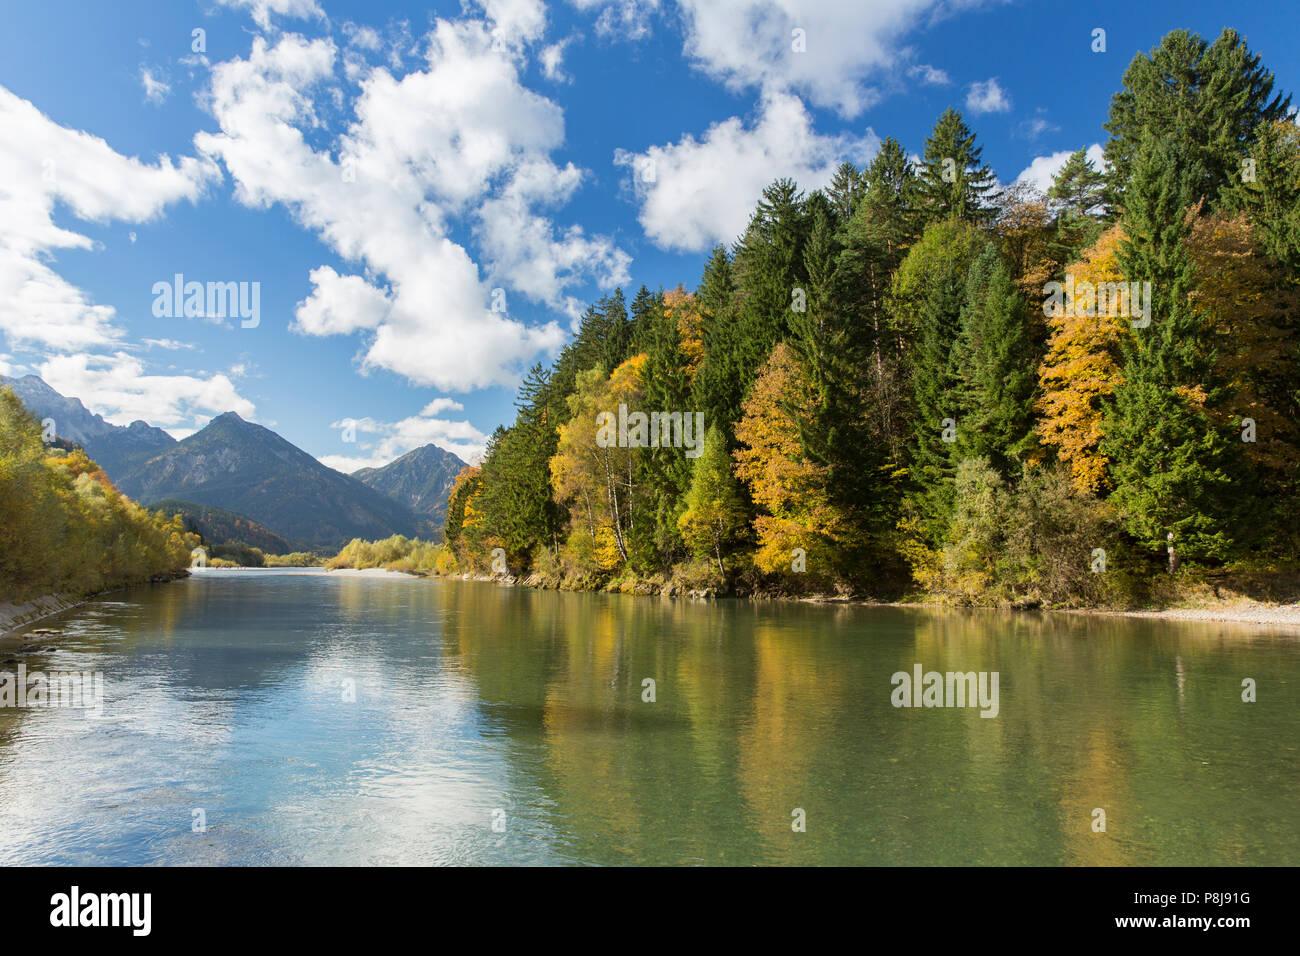 The river Lech with autumnal forest near the Ziegelwiesen, Füssen, Bavaria, Germany Stock Photo